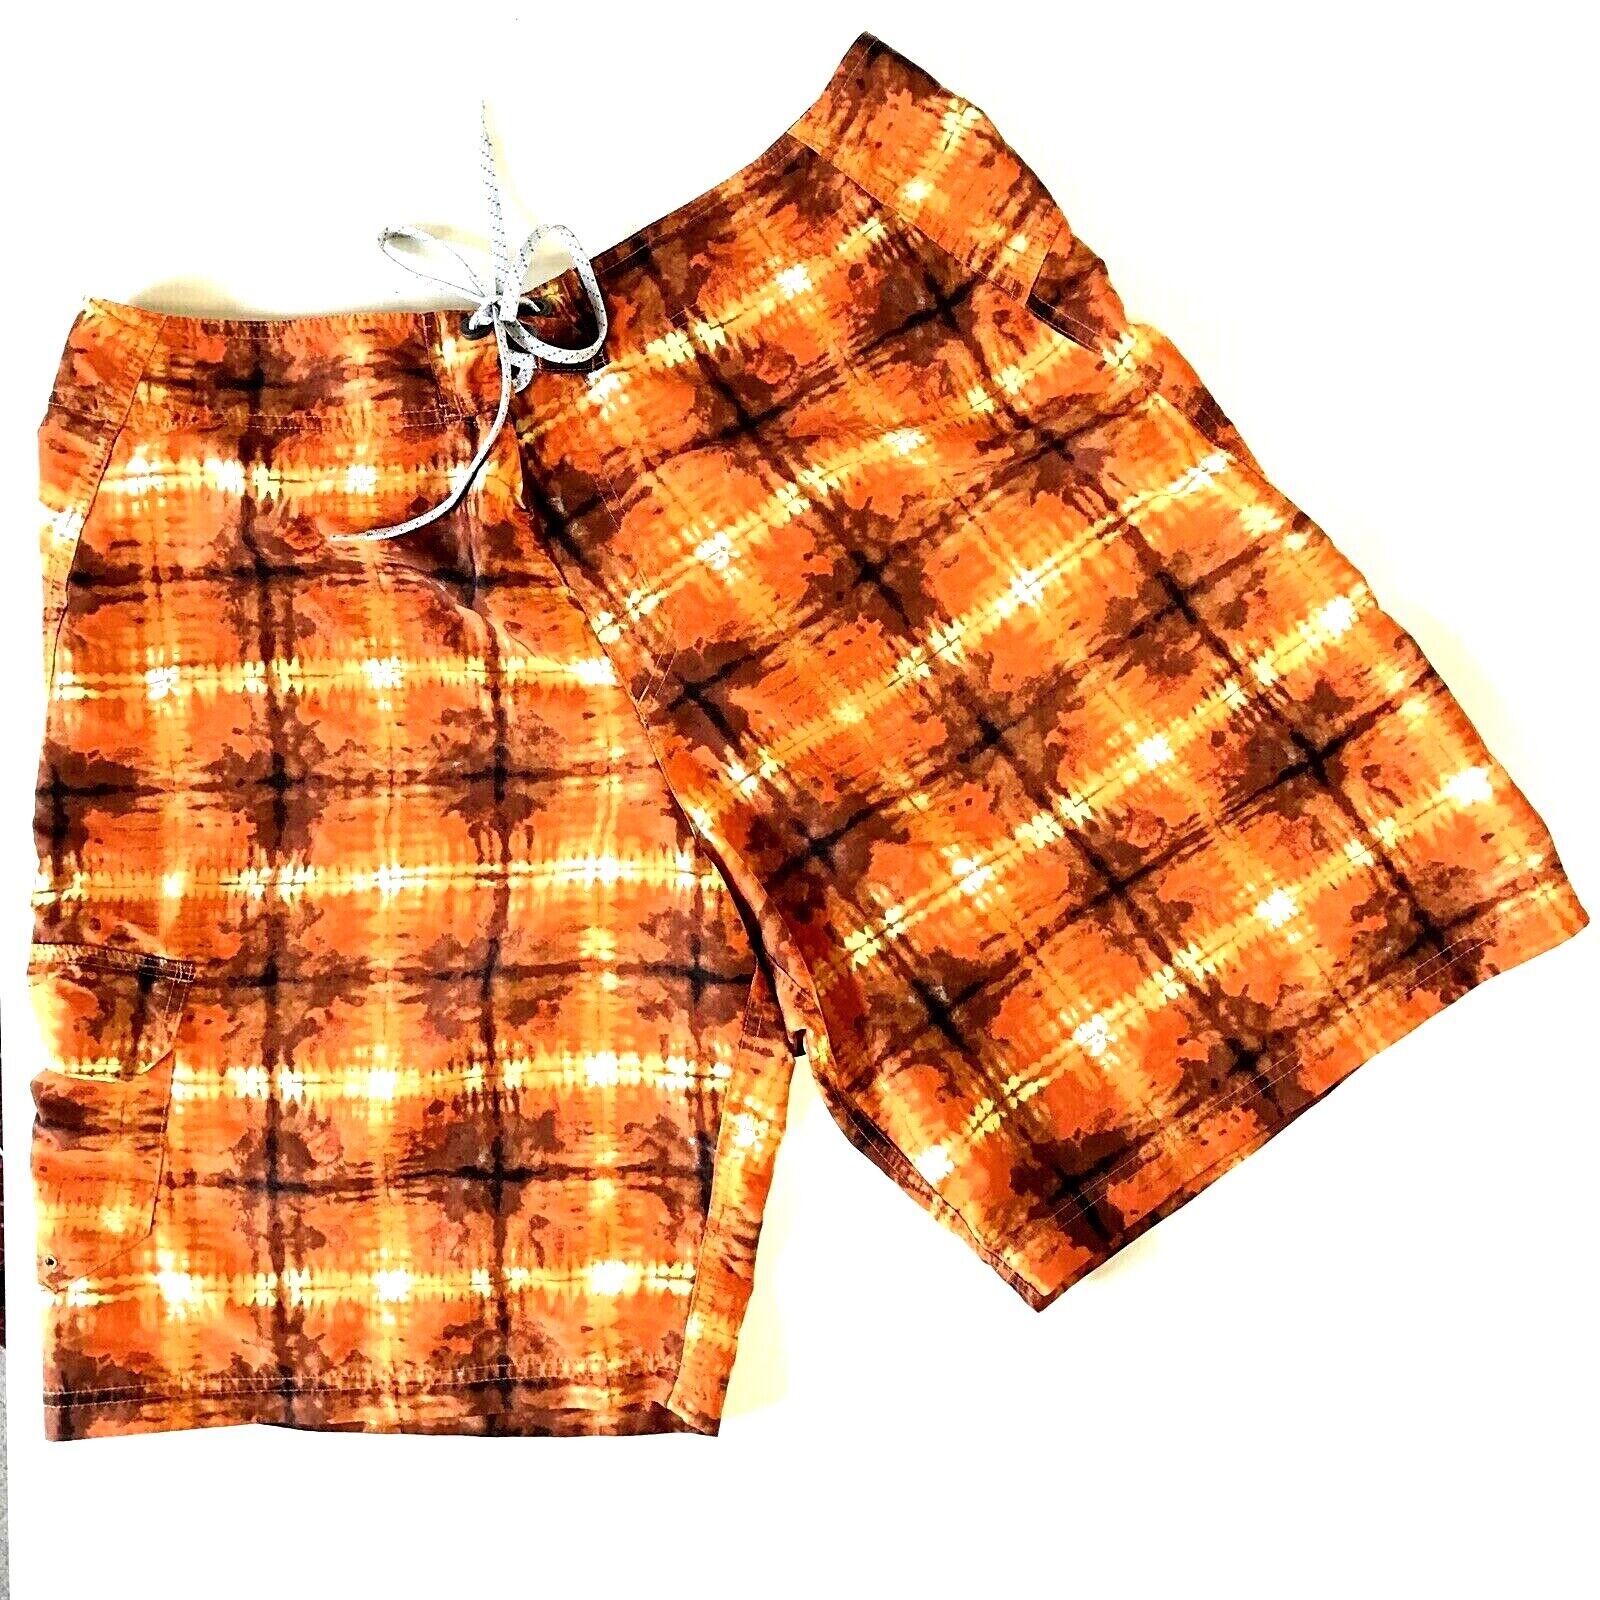 Columbia Mens Shorts 36 Board Swim Trunks orange Tie Dye 69742